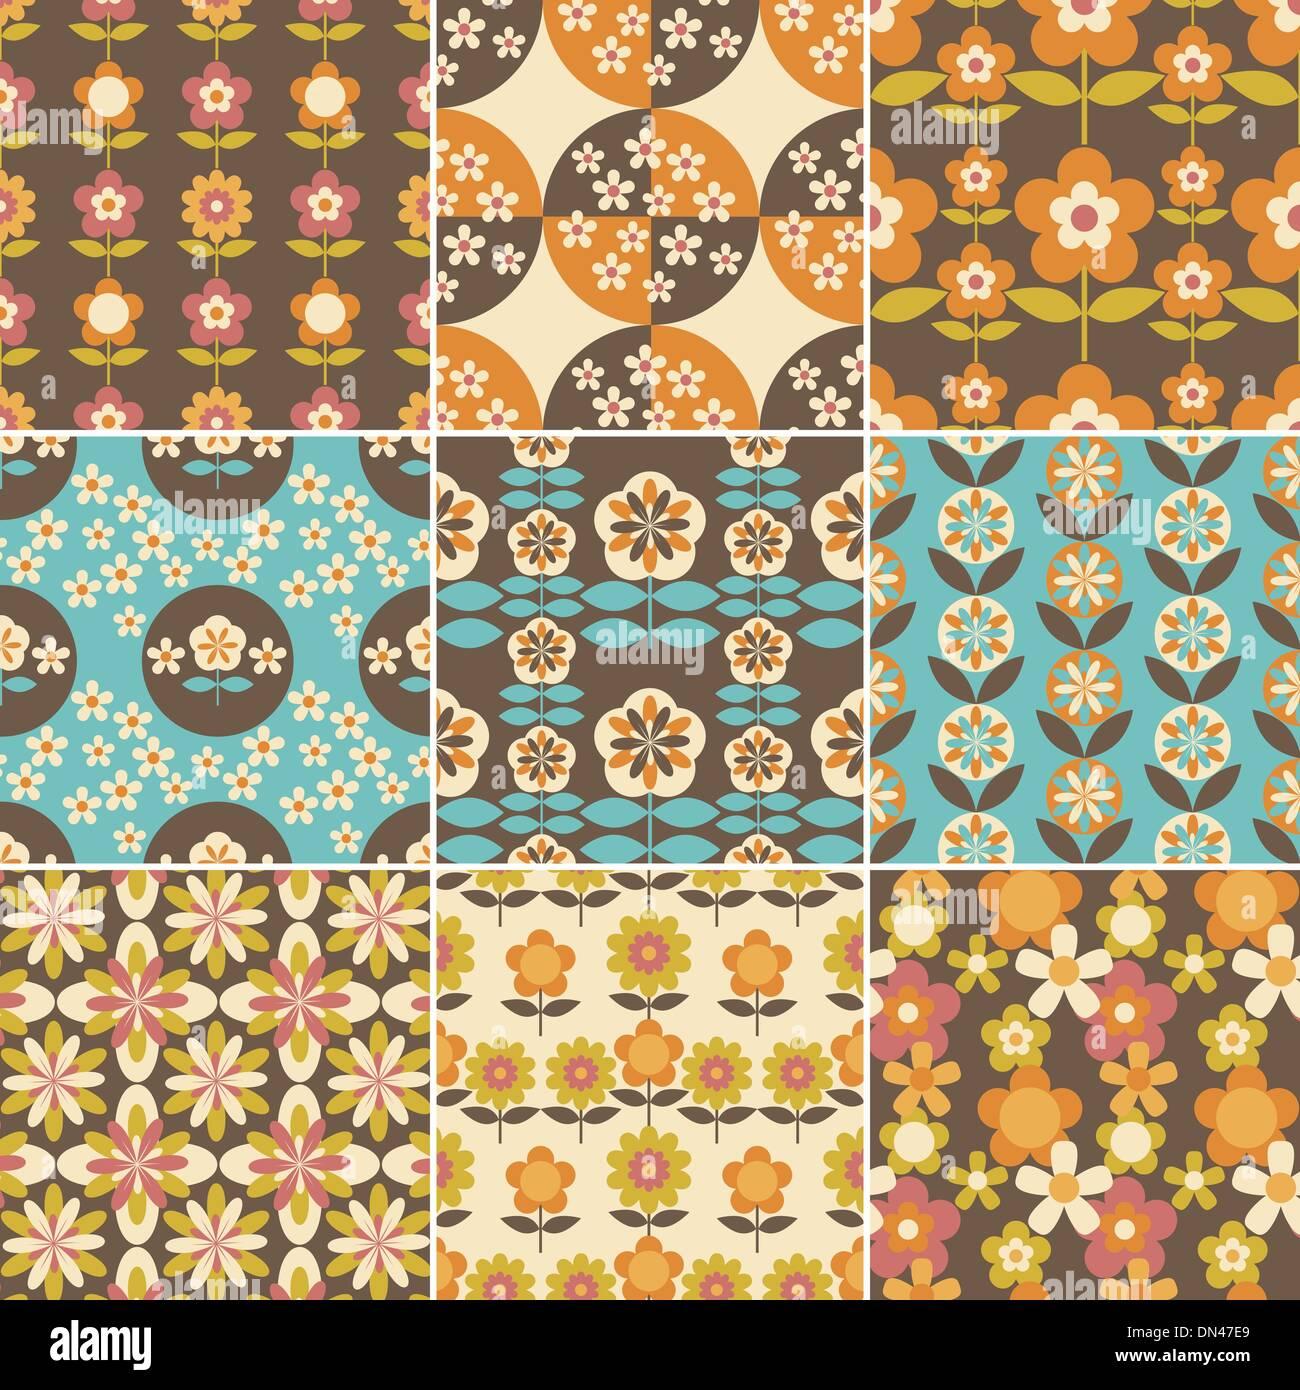 Design 70s Design set of 70s seamless patterns design stock vector art design